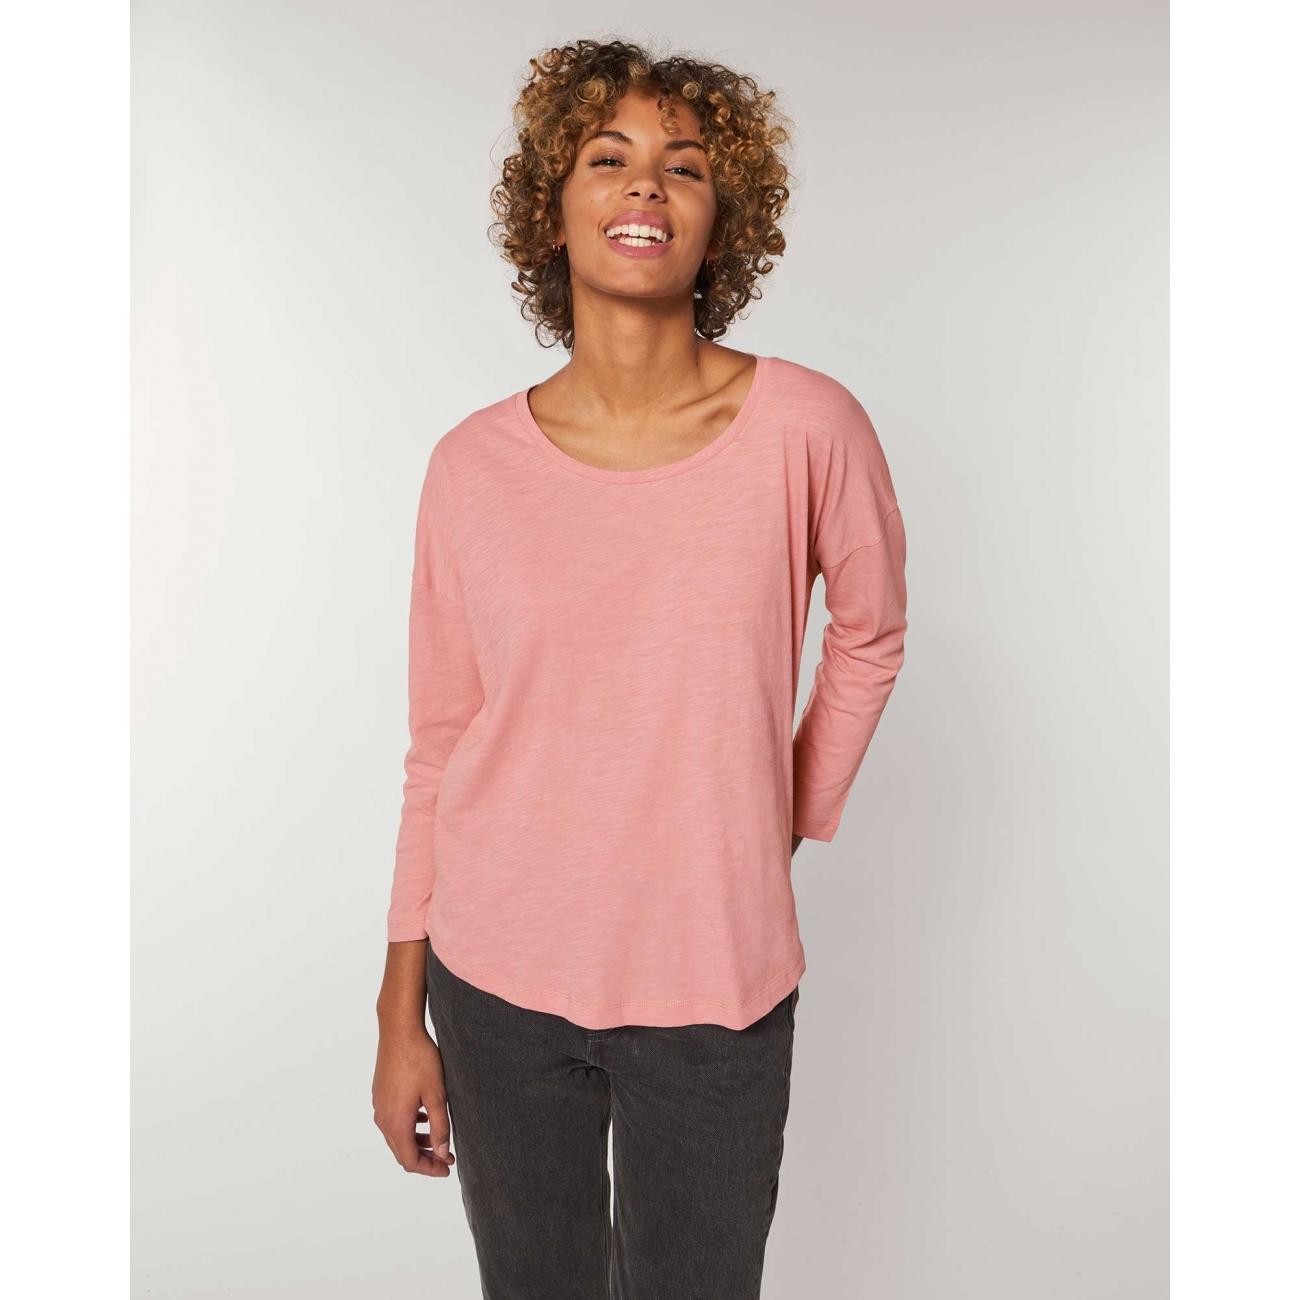 https://tee-shirt-bio.com/9195-thickbox_default/tshirt-femme-manches-34-epaules-tombantes-manches-serrees-coton-bio-fwf-rose-flamme-.jpg